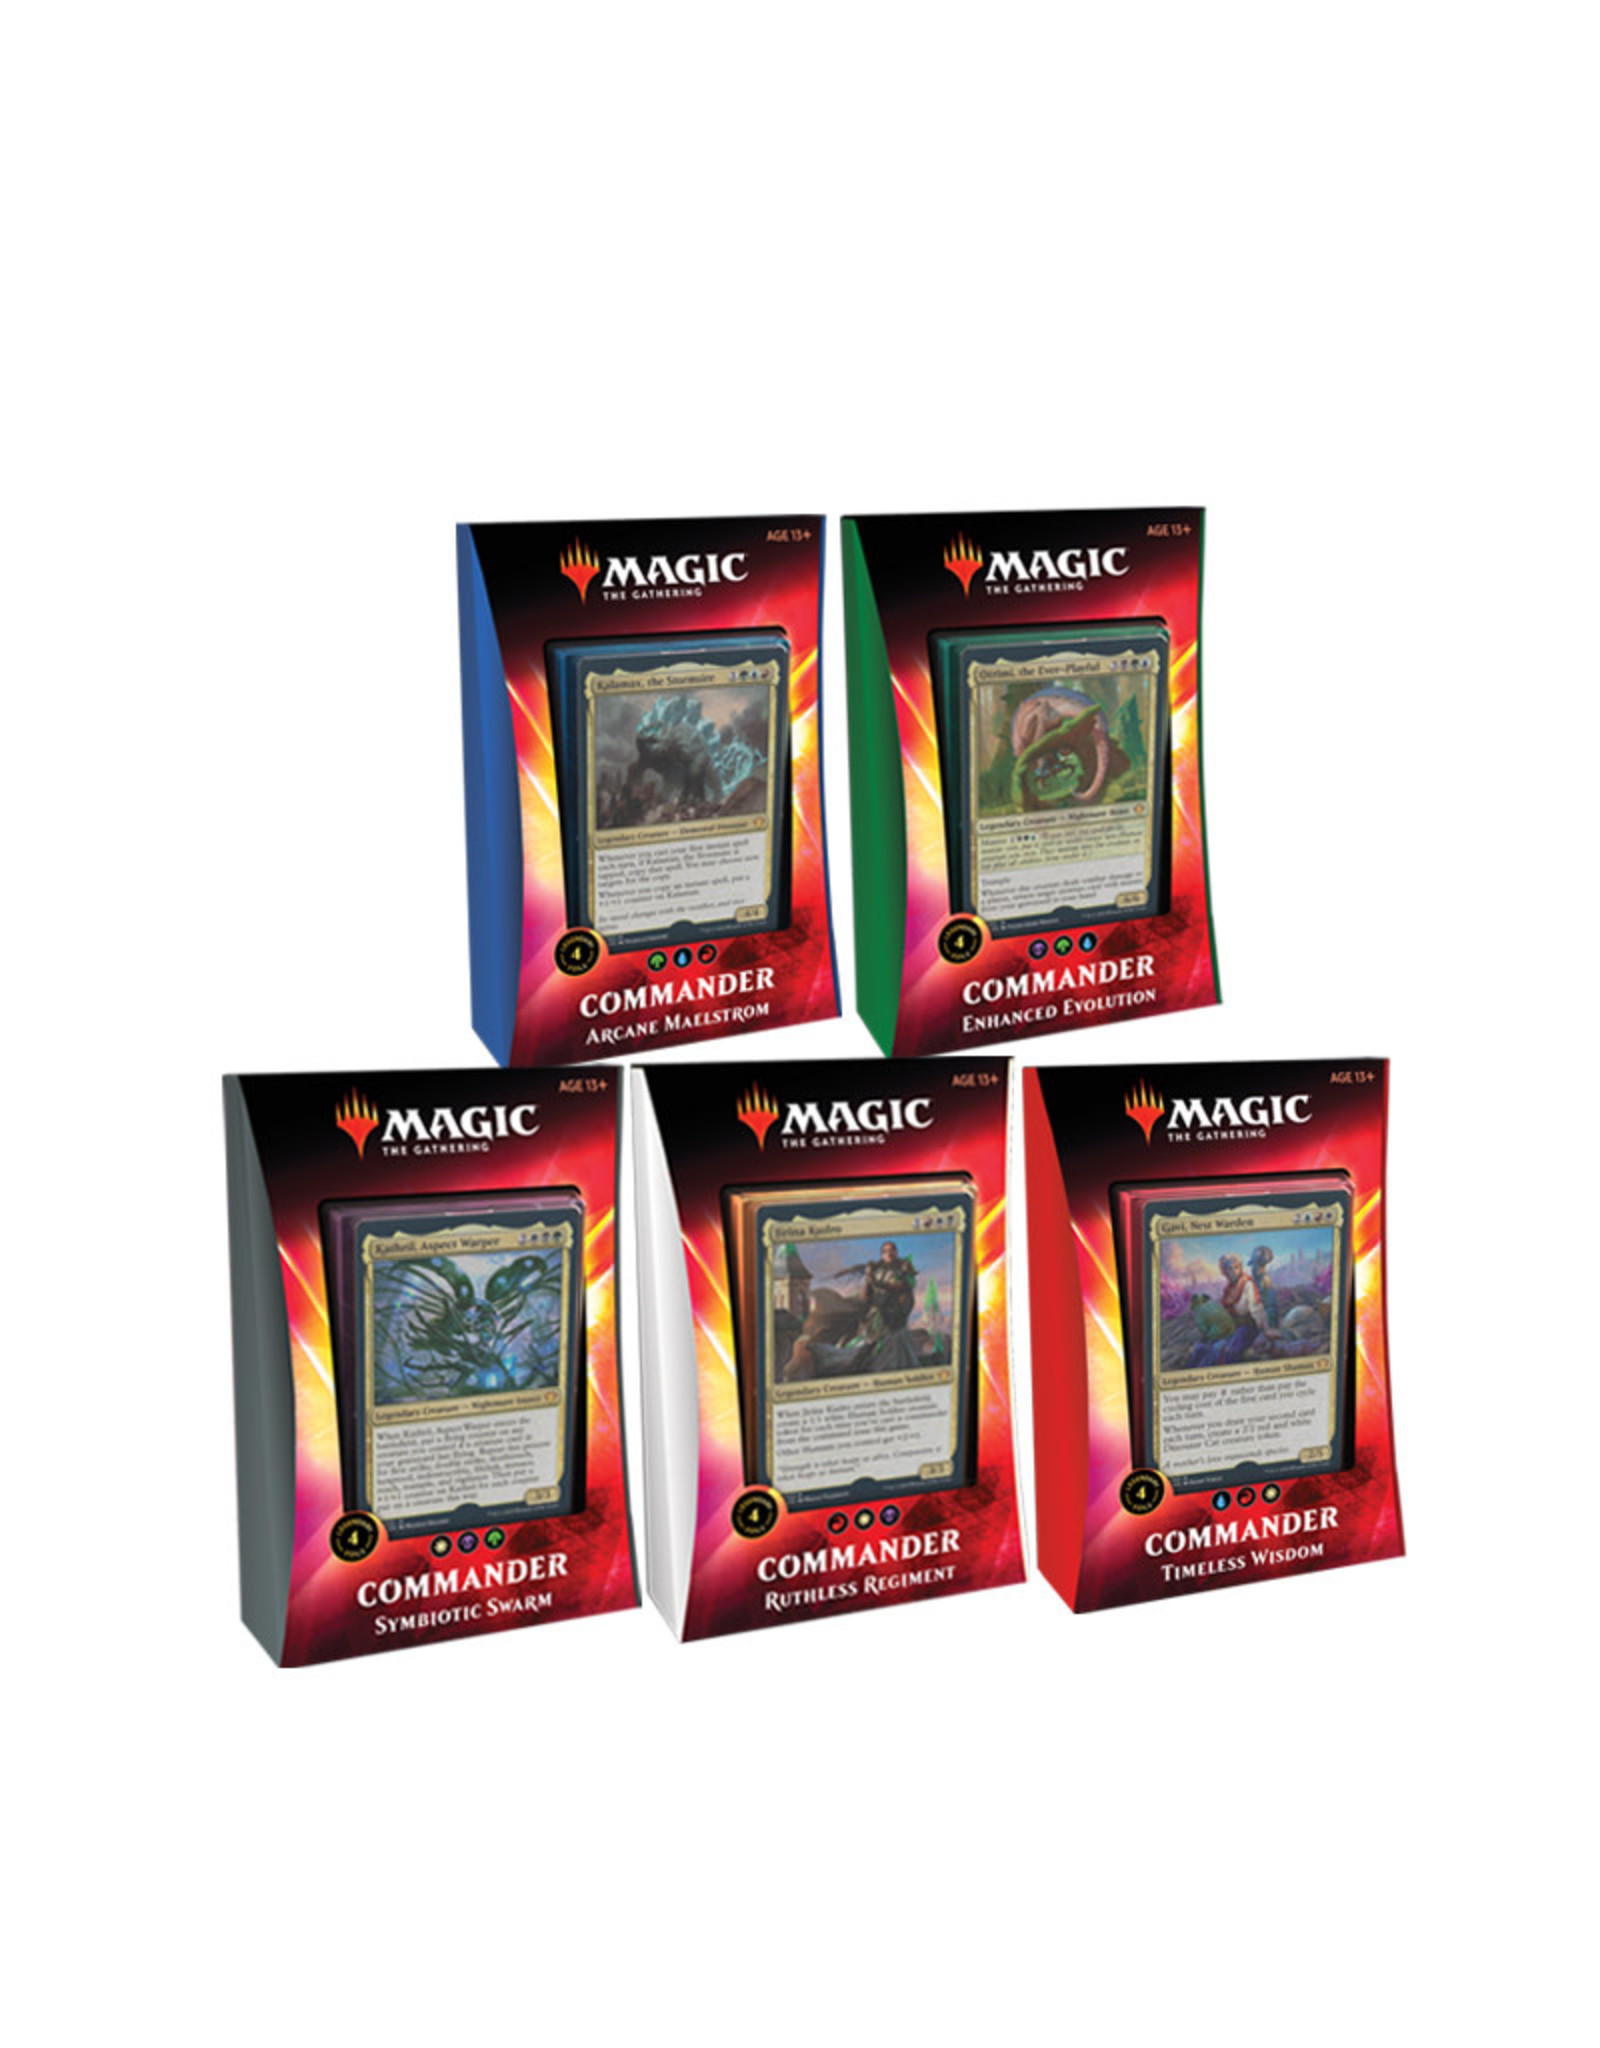 Wizards of the Coast MTG Ikoria Commander Deck Display (All 5 Decks)